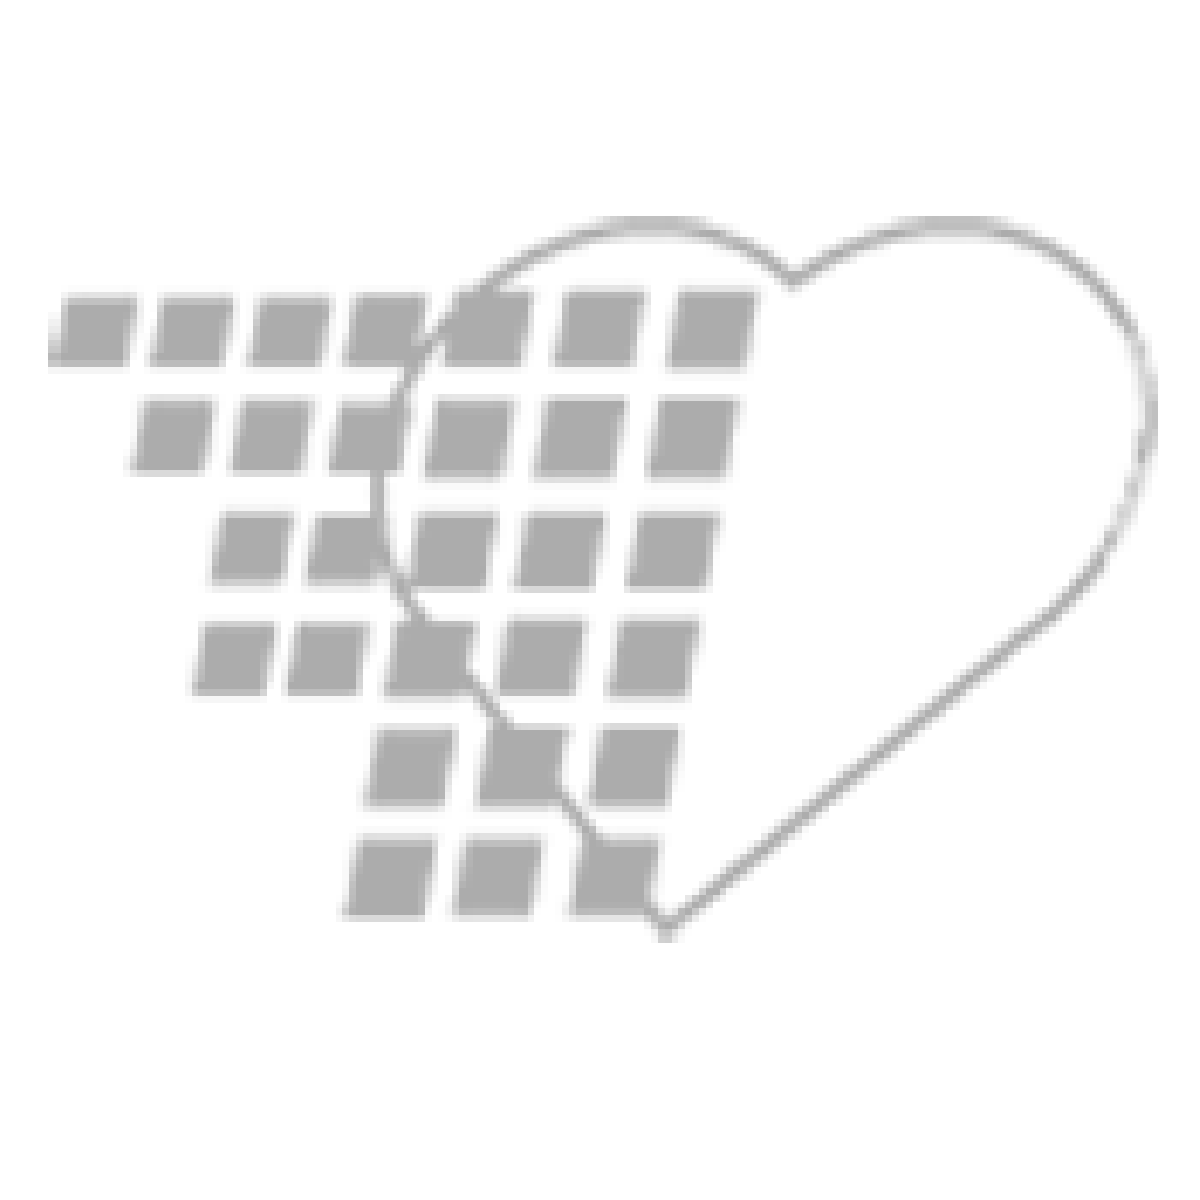 06-93-0047 - Demo Dose® DiaBet 3 mg - 100 Pills/Box